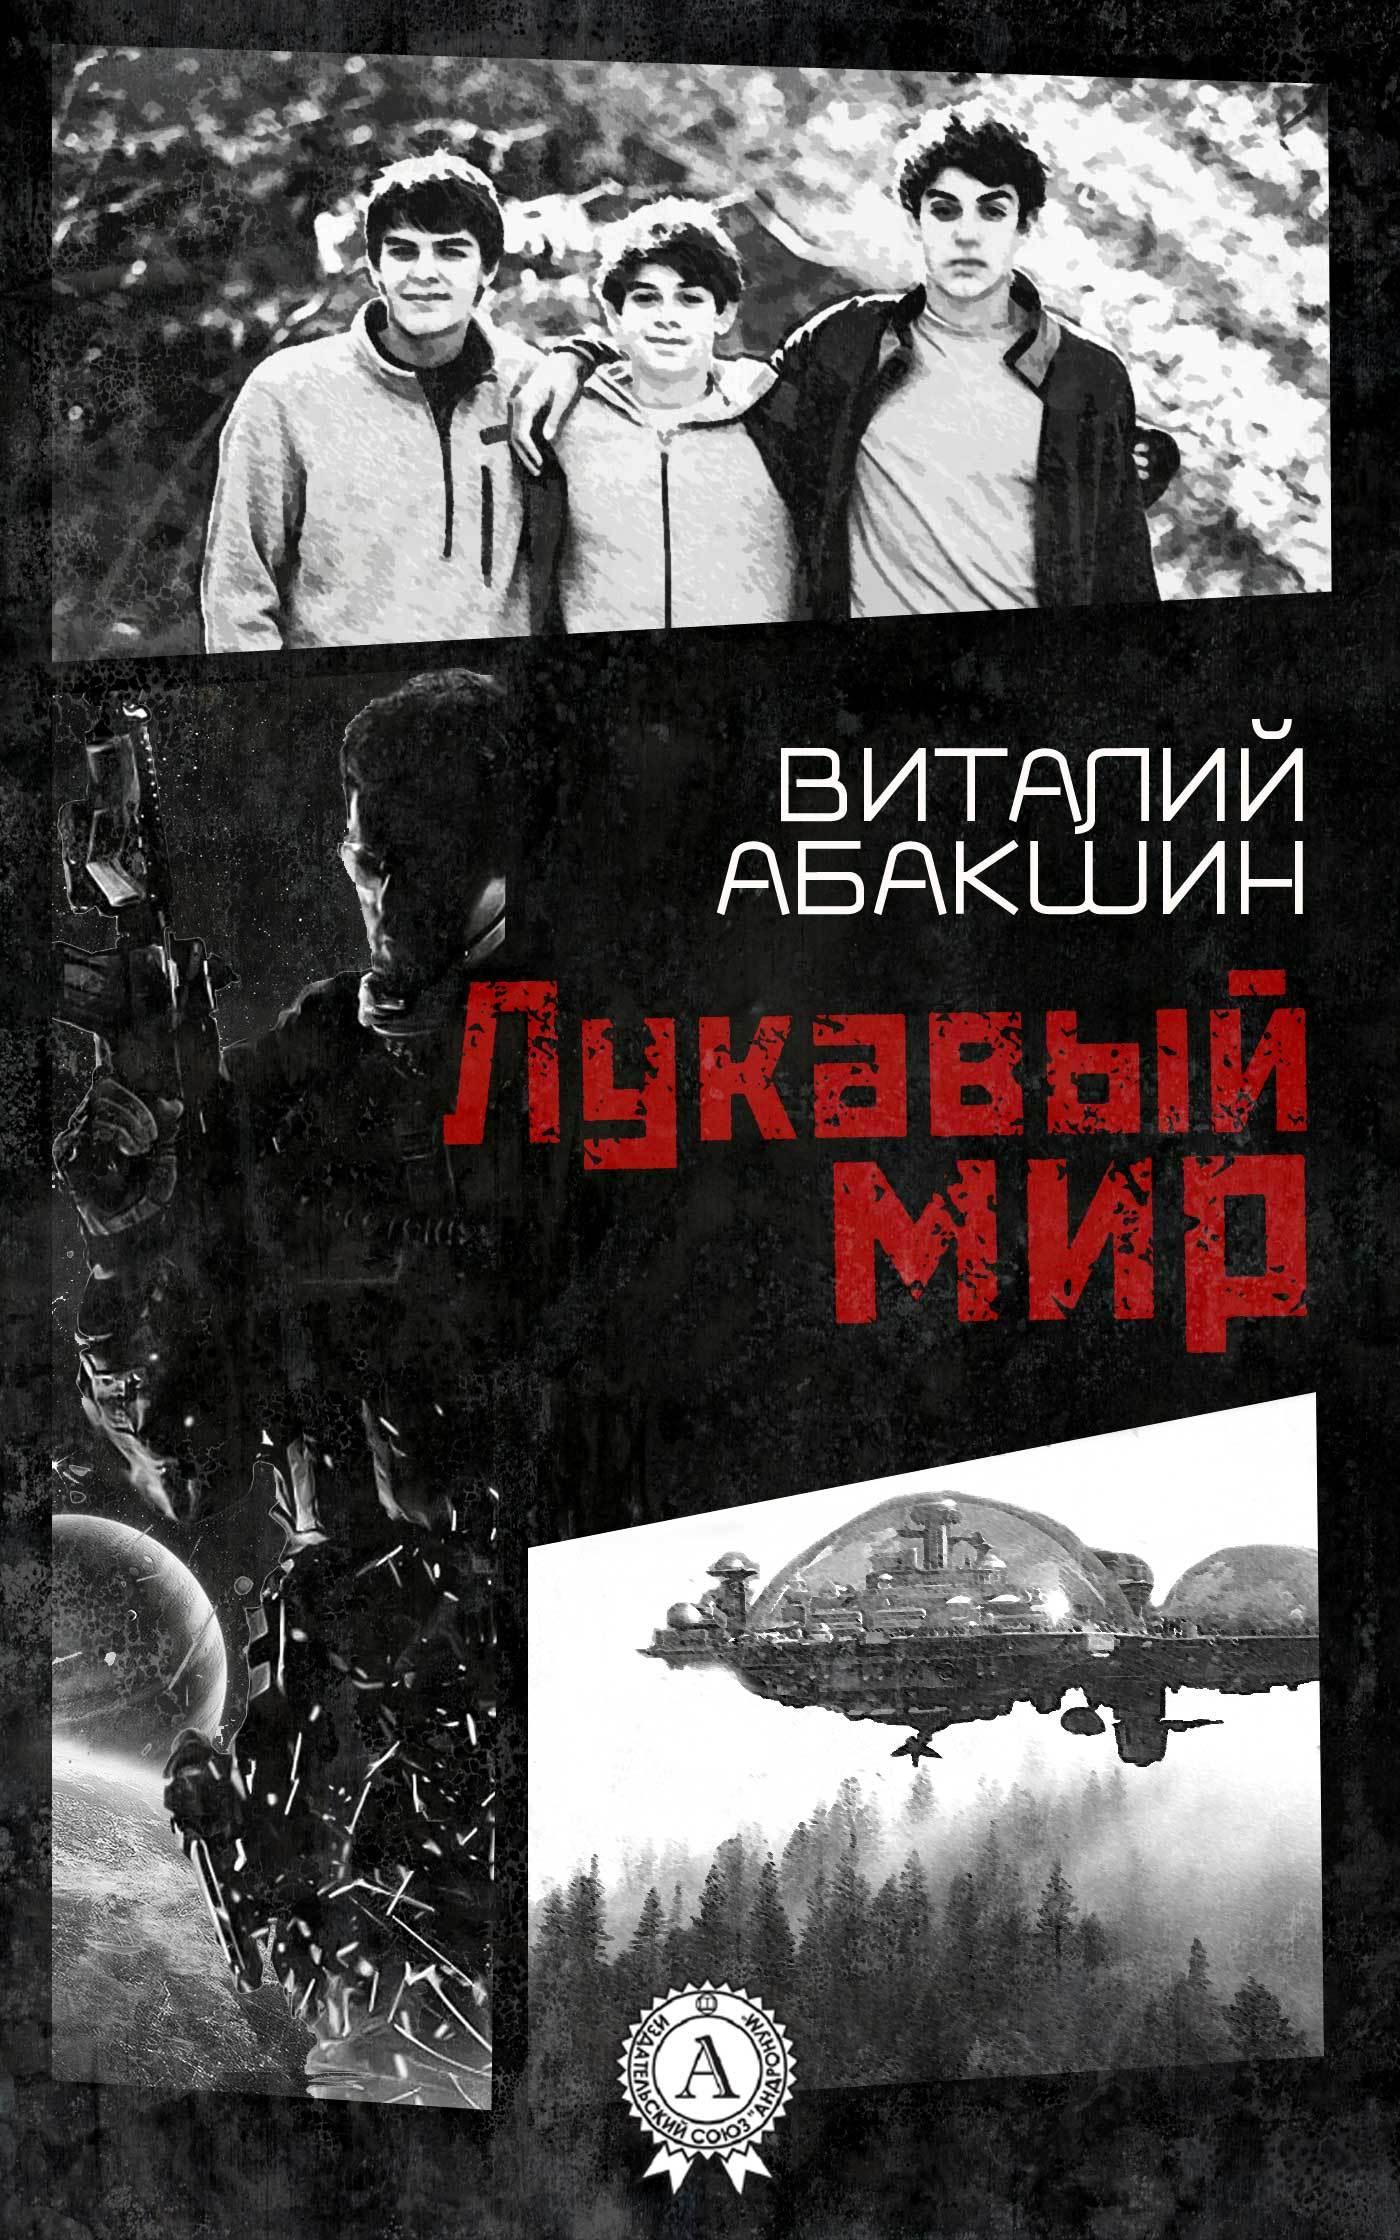 Виталий Абакшин бесплатно